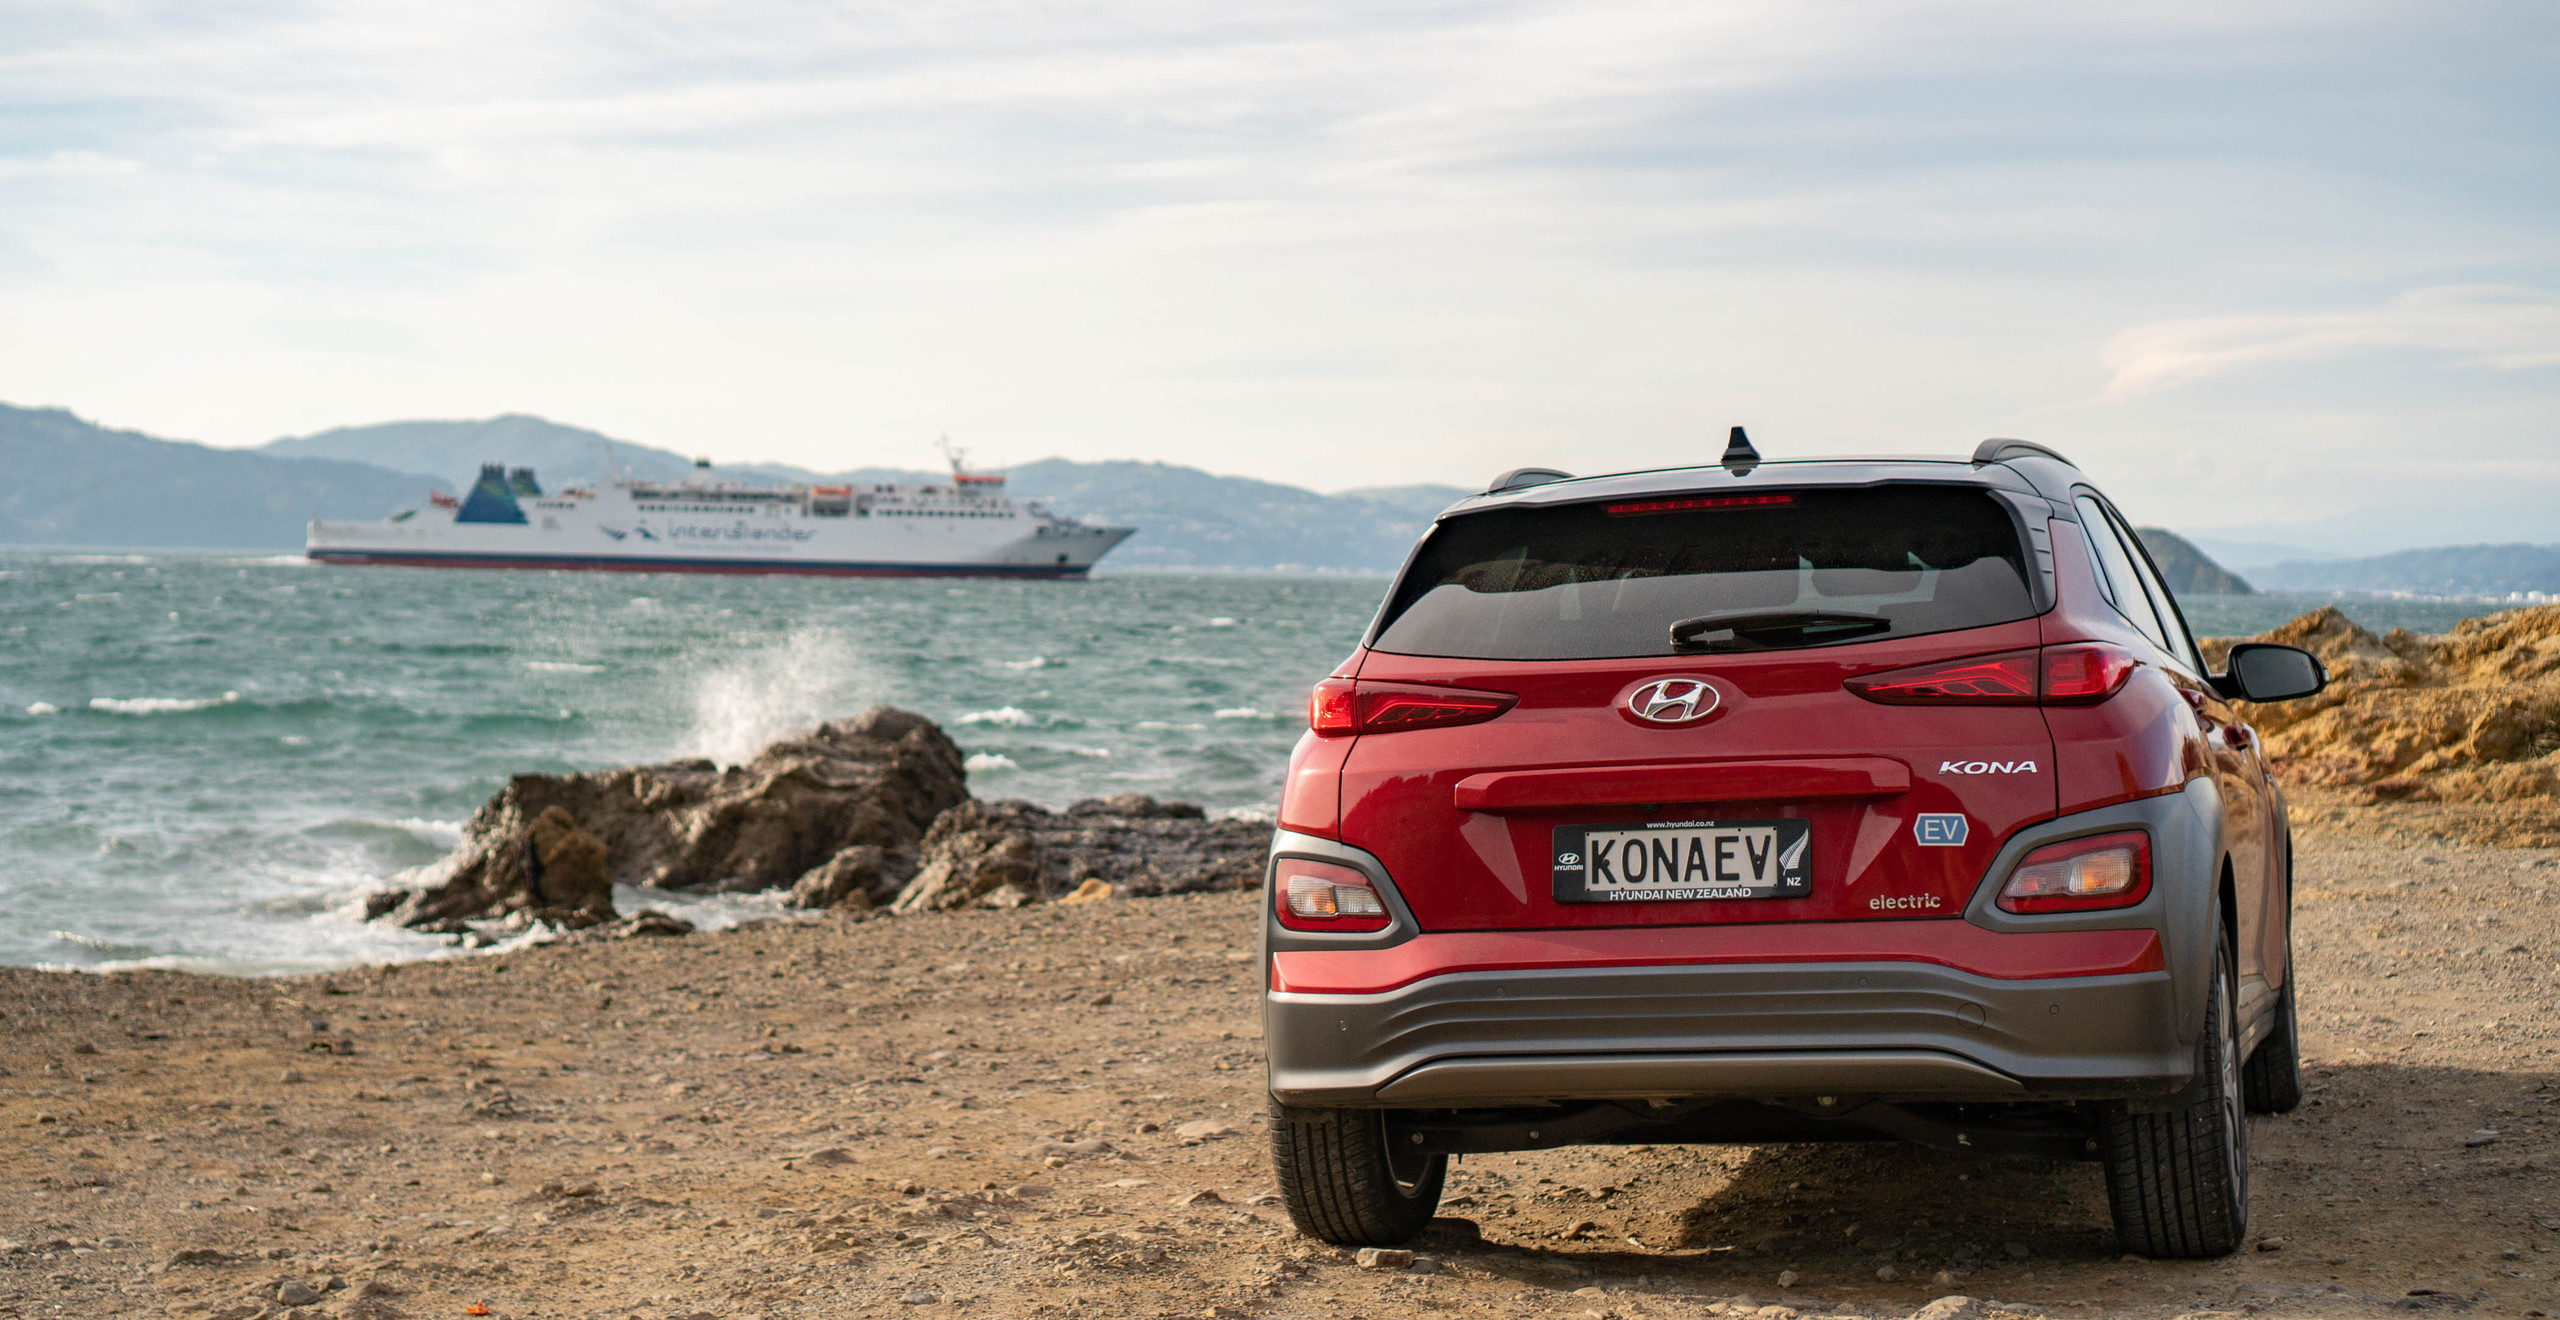 Hyundai Kona Electric 2019 front exterior red Wellington New Zealand Interislander beach